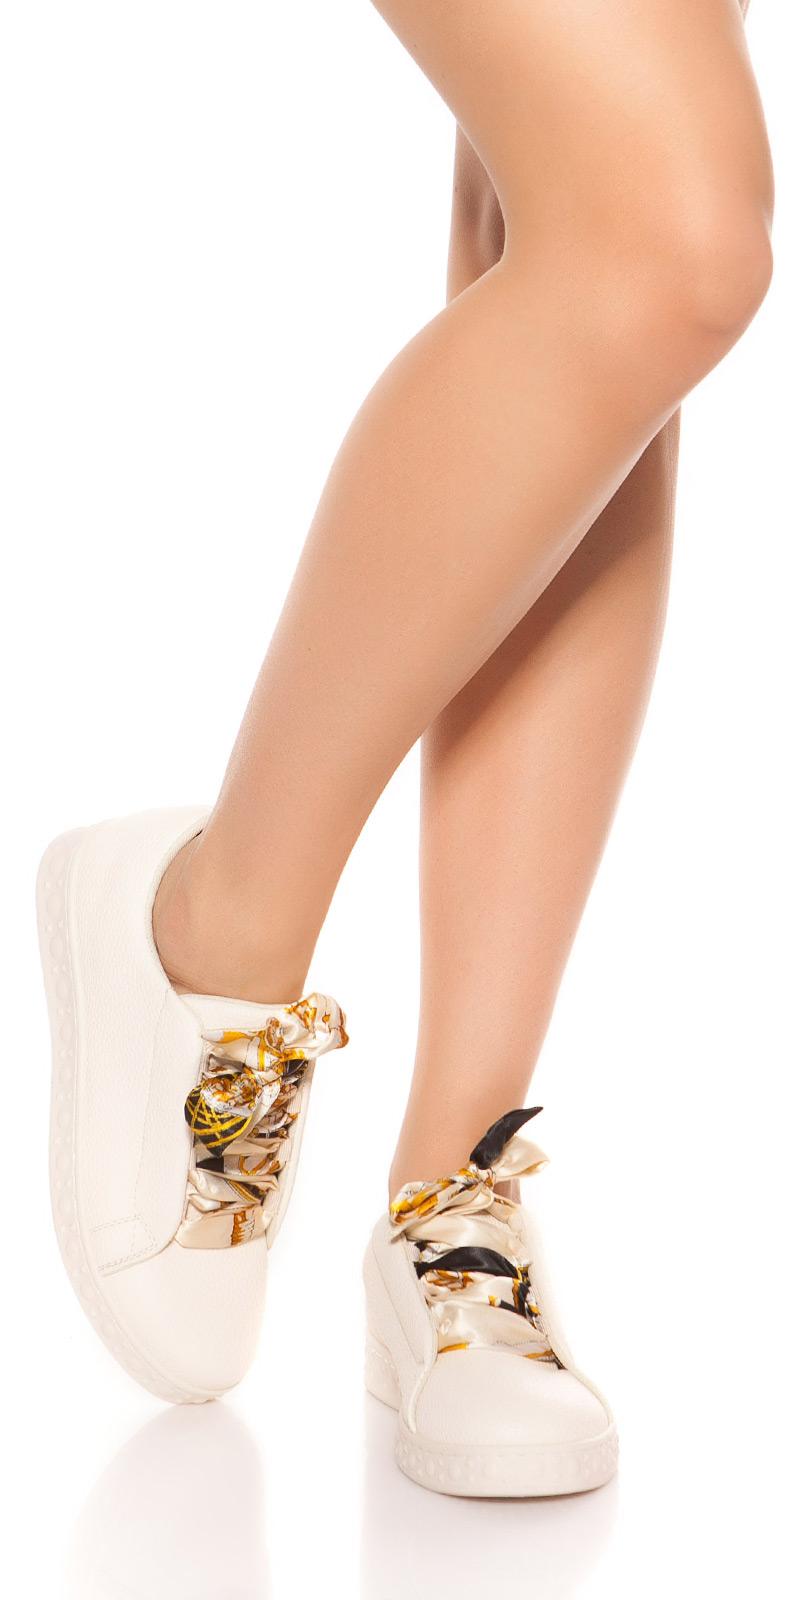 Adidasi la moda cu decorative dantela